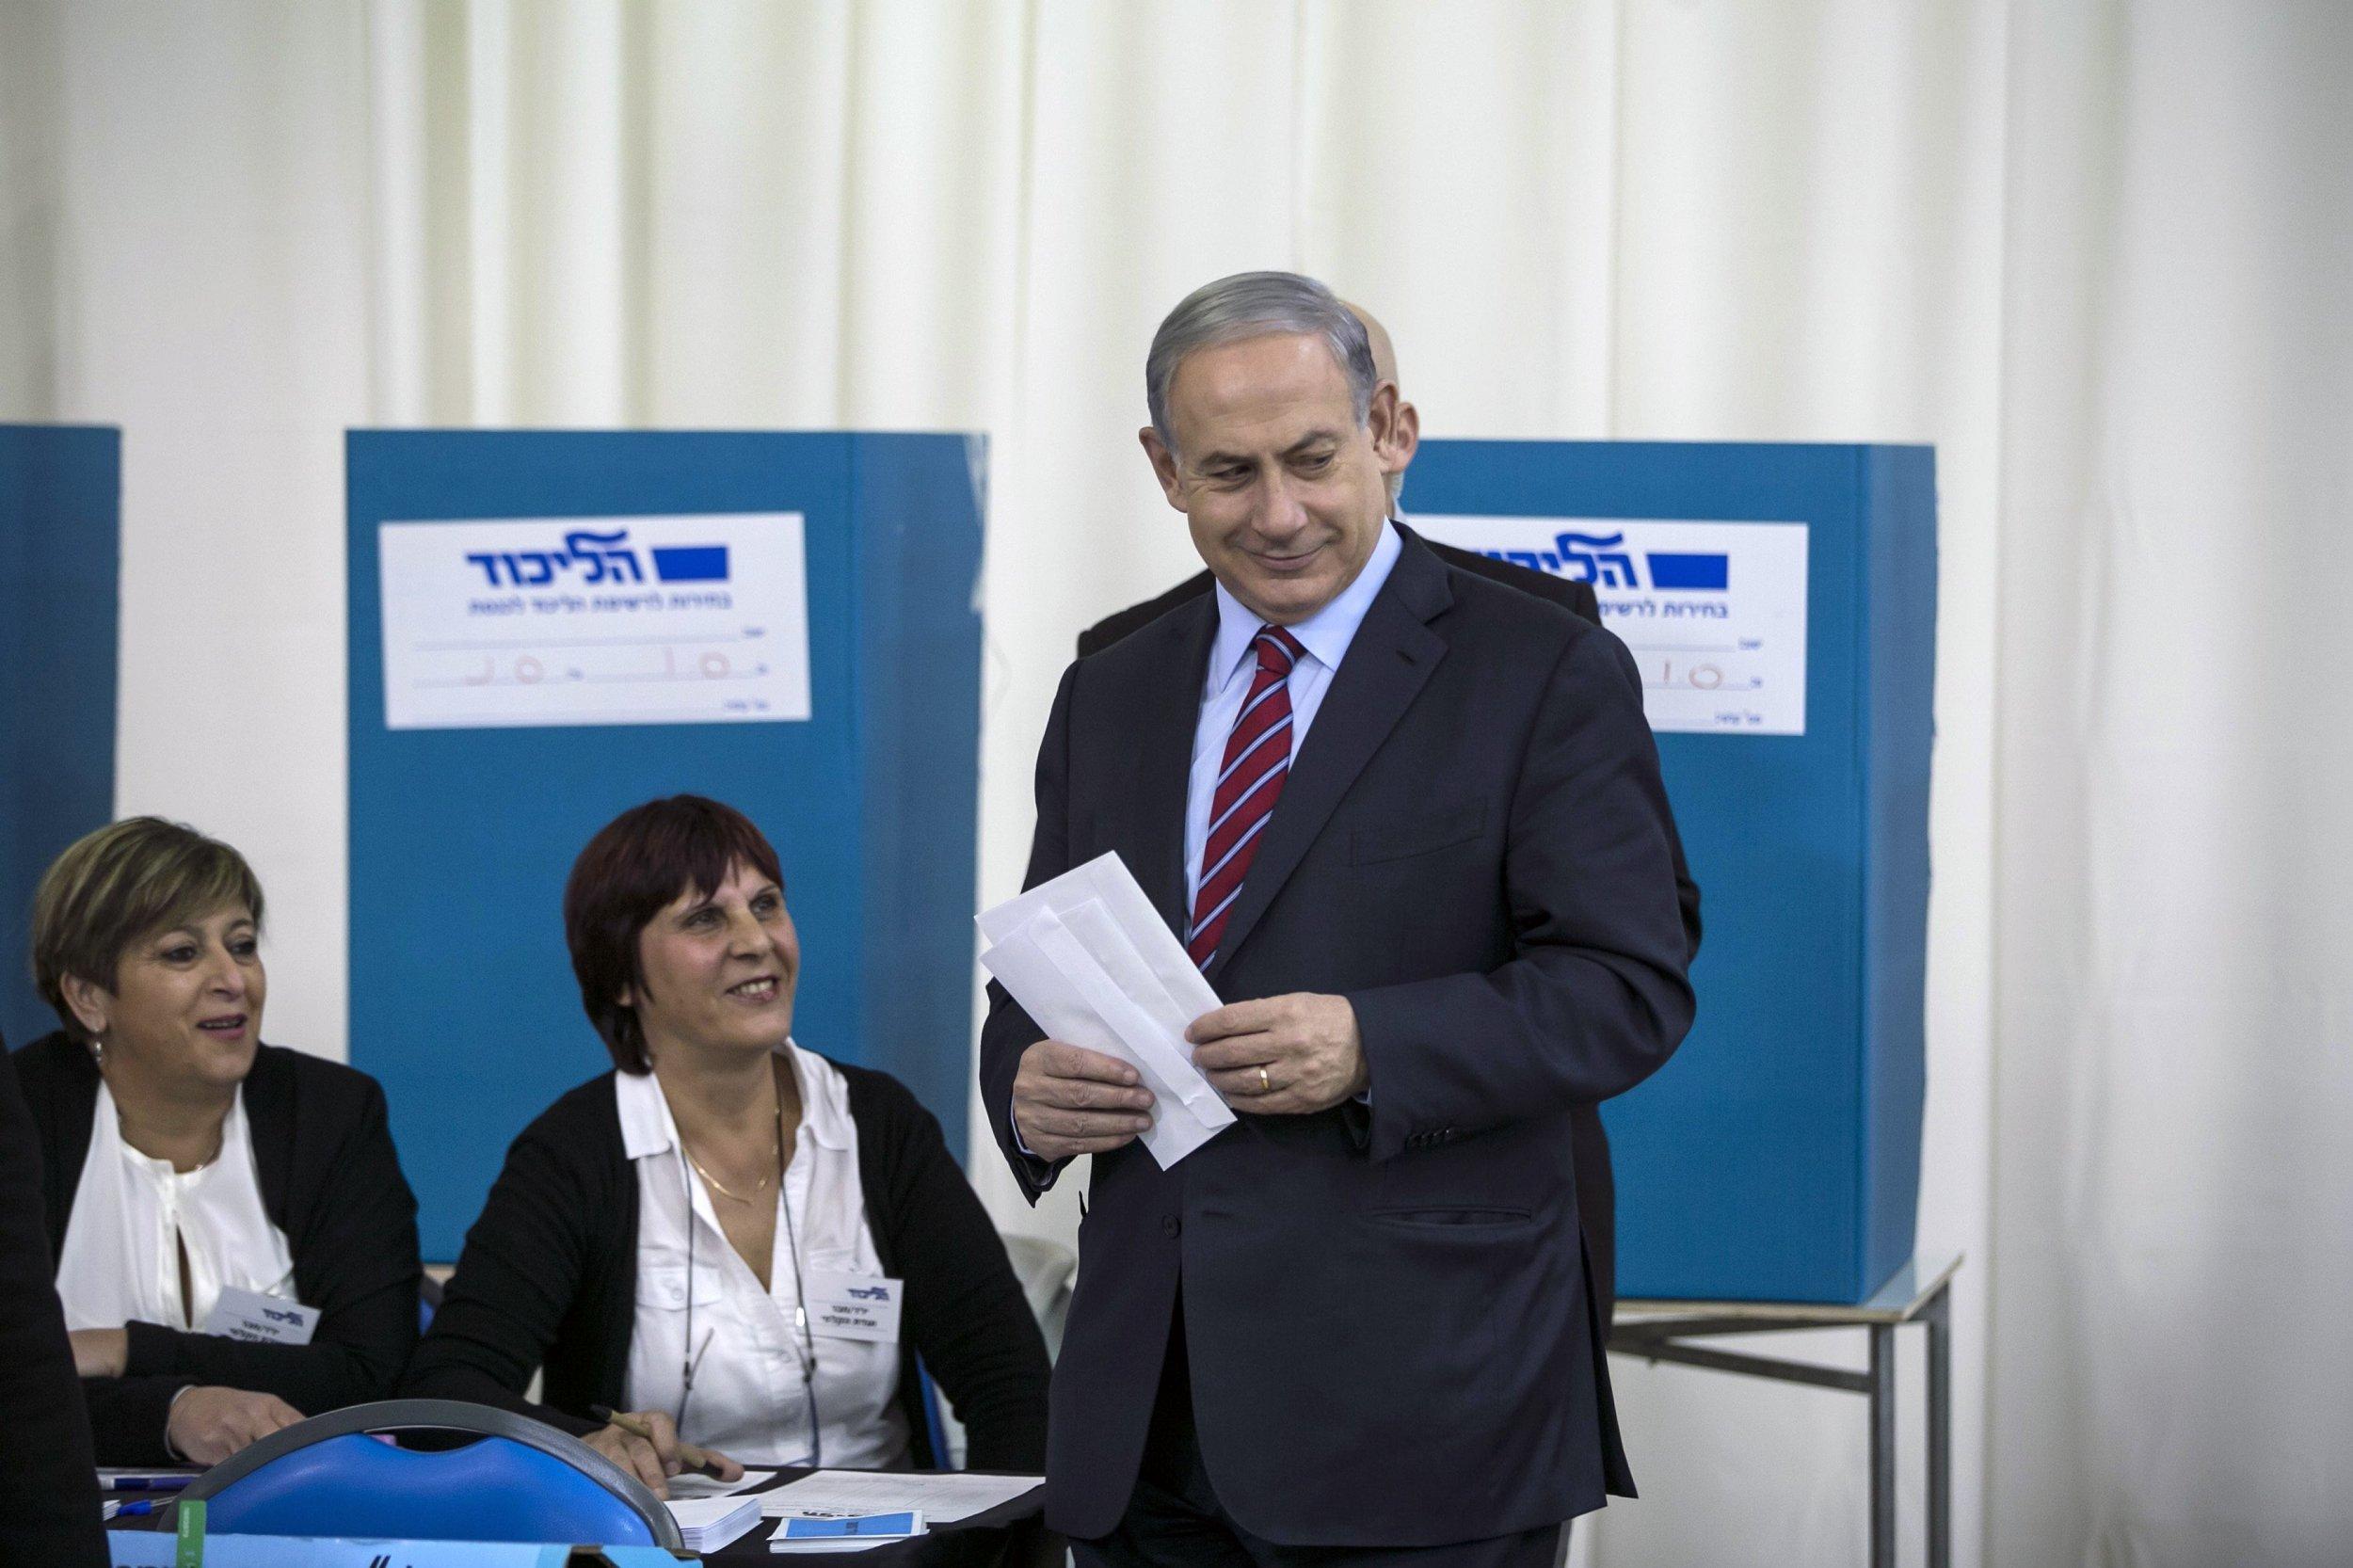 2014-12-31T141636Z_1259230796_GM1EACV1PTH01_RTRMADP_3_ISRAEL-POLITICS